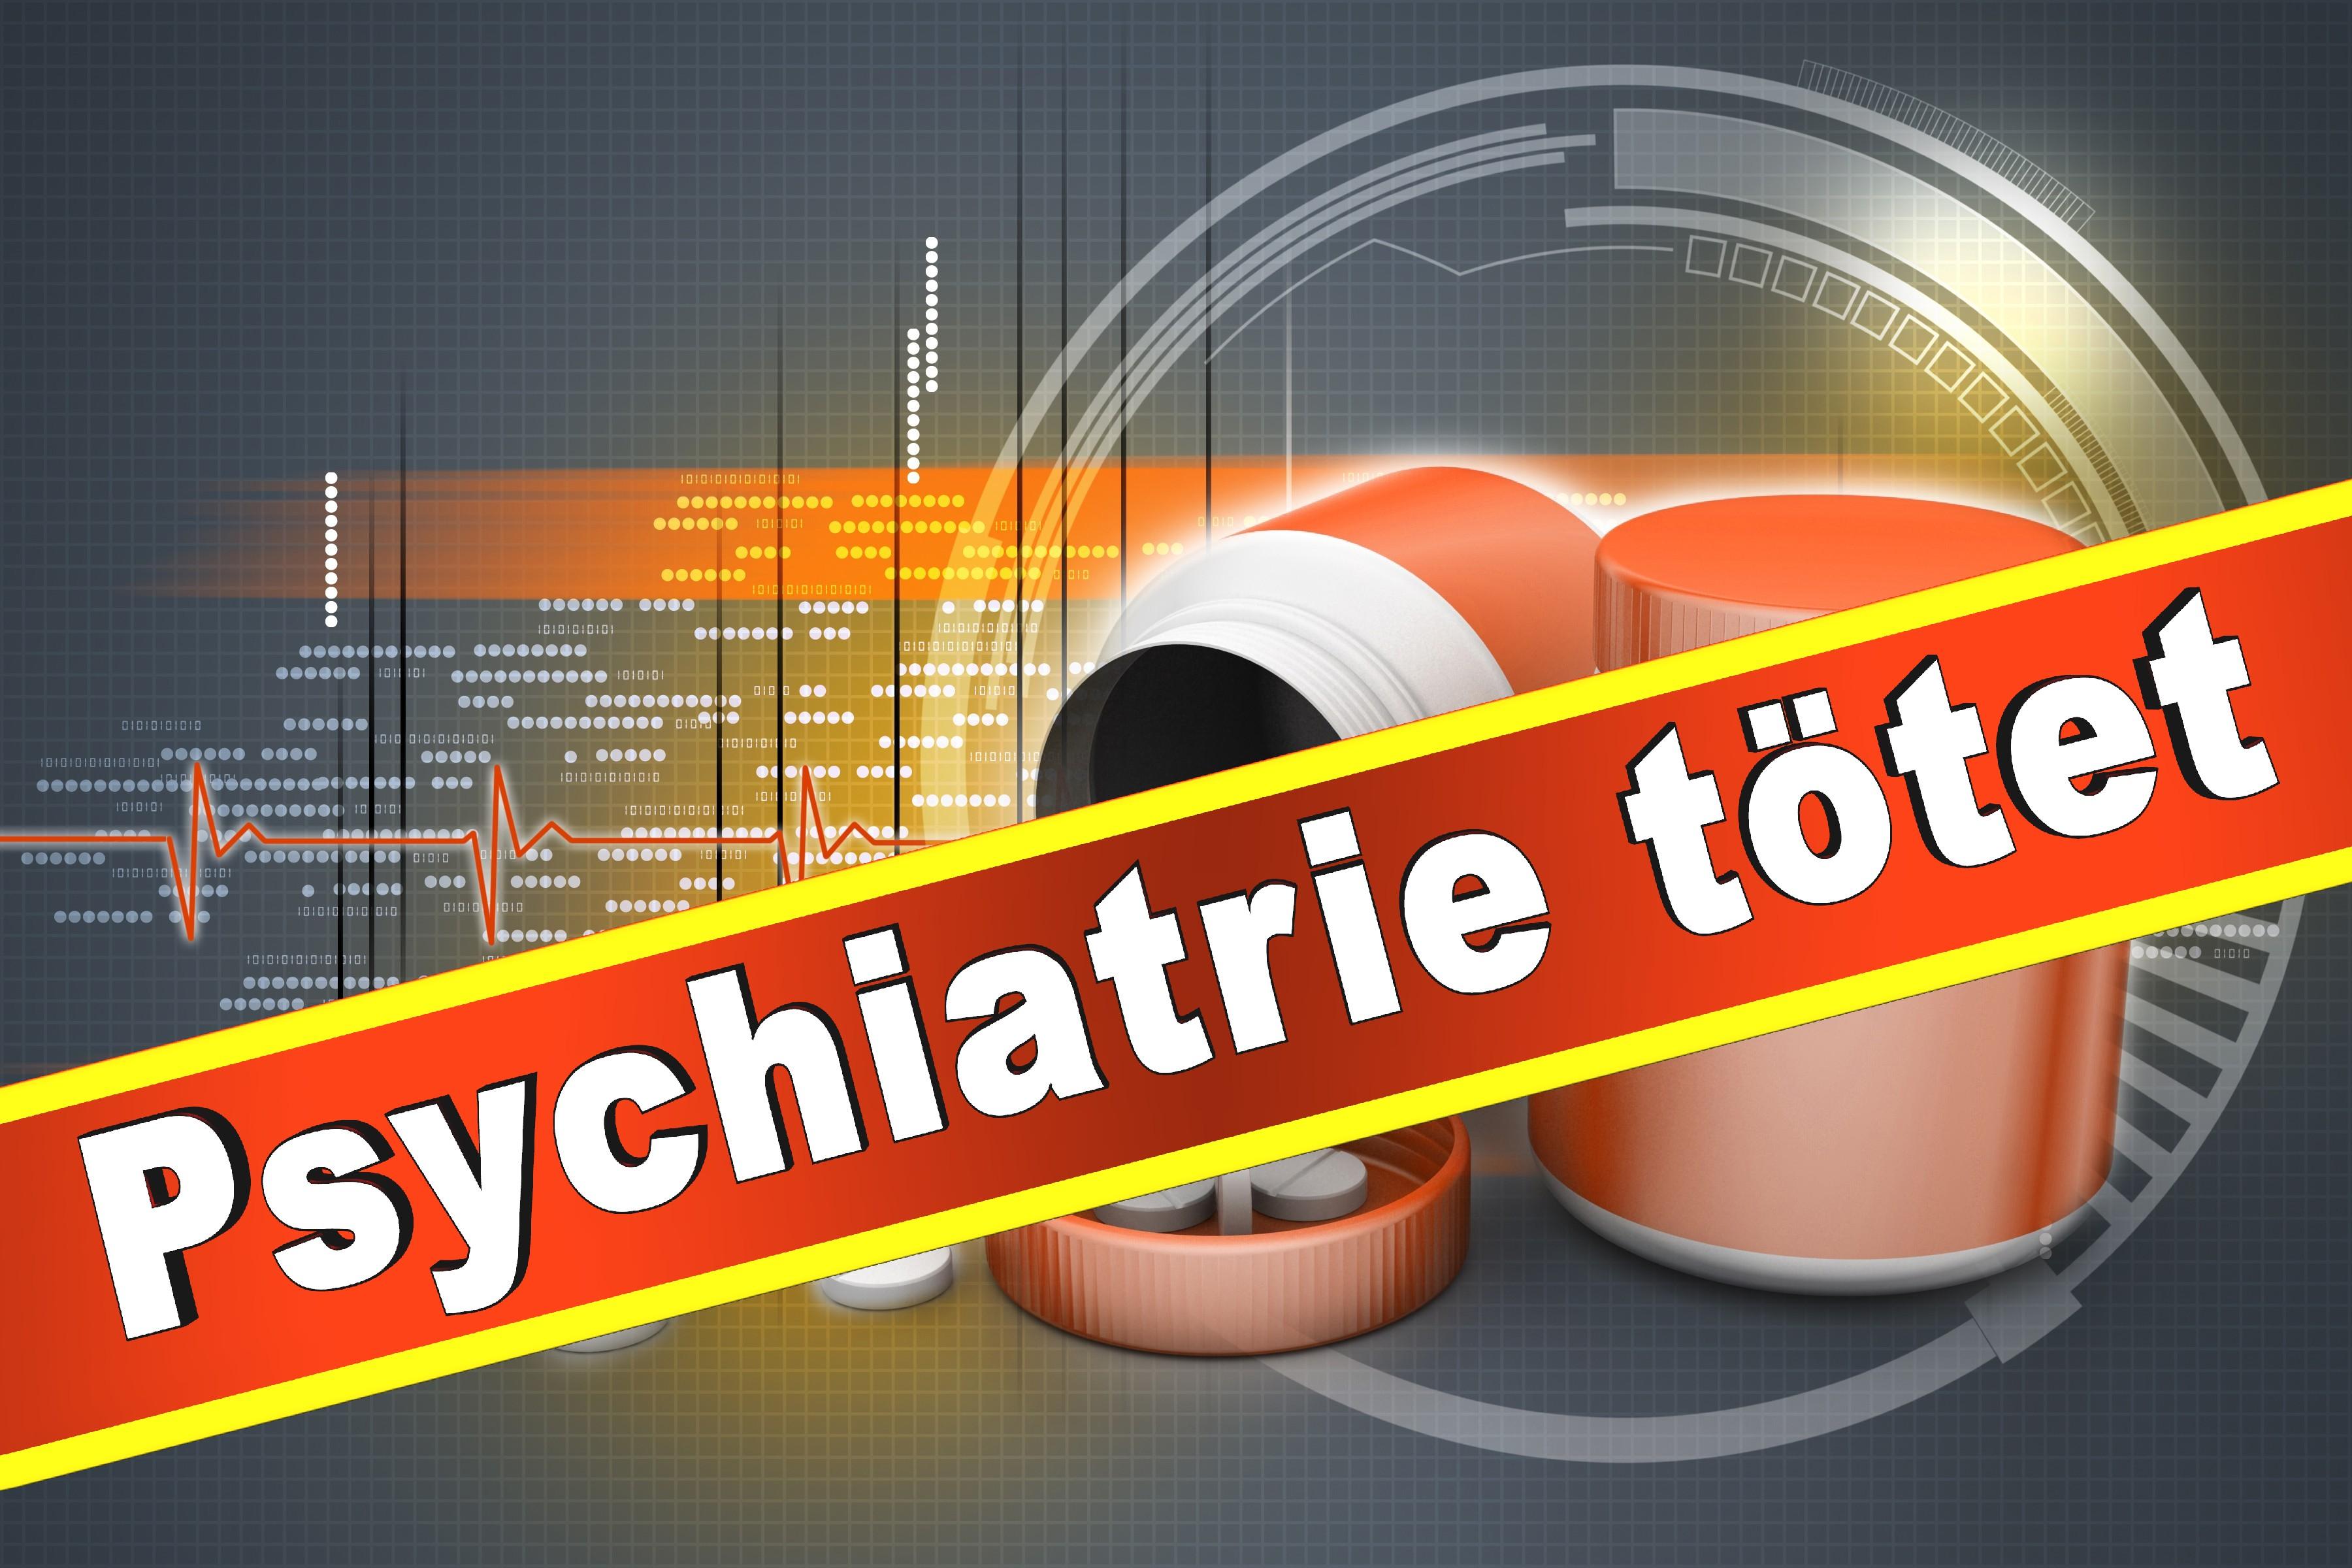 Frau Dr Med Christiane Habermann Psychotherapeut Hannover Gutachten Psychiater Facharzt Psychiatrie